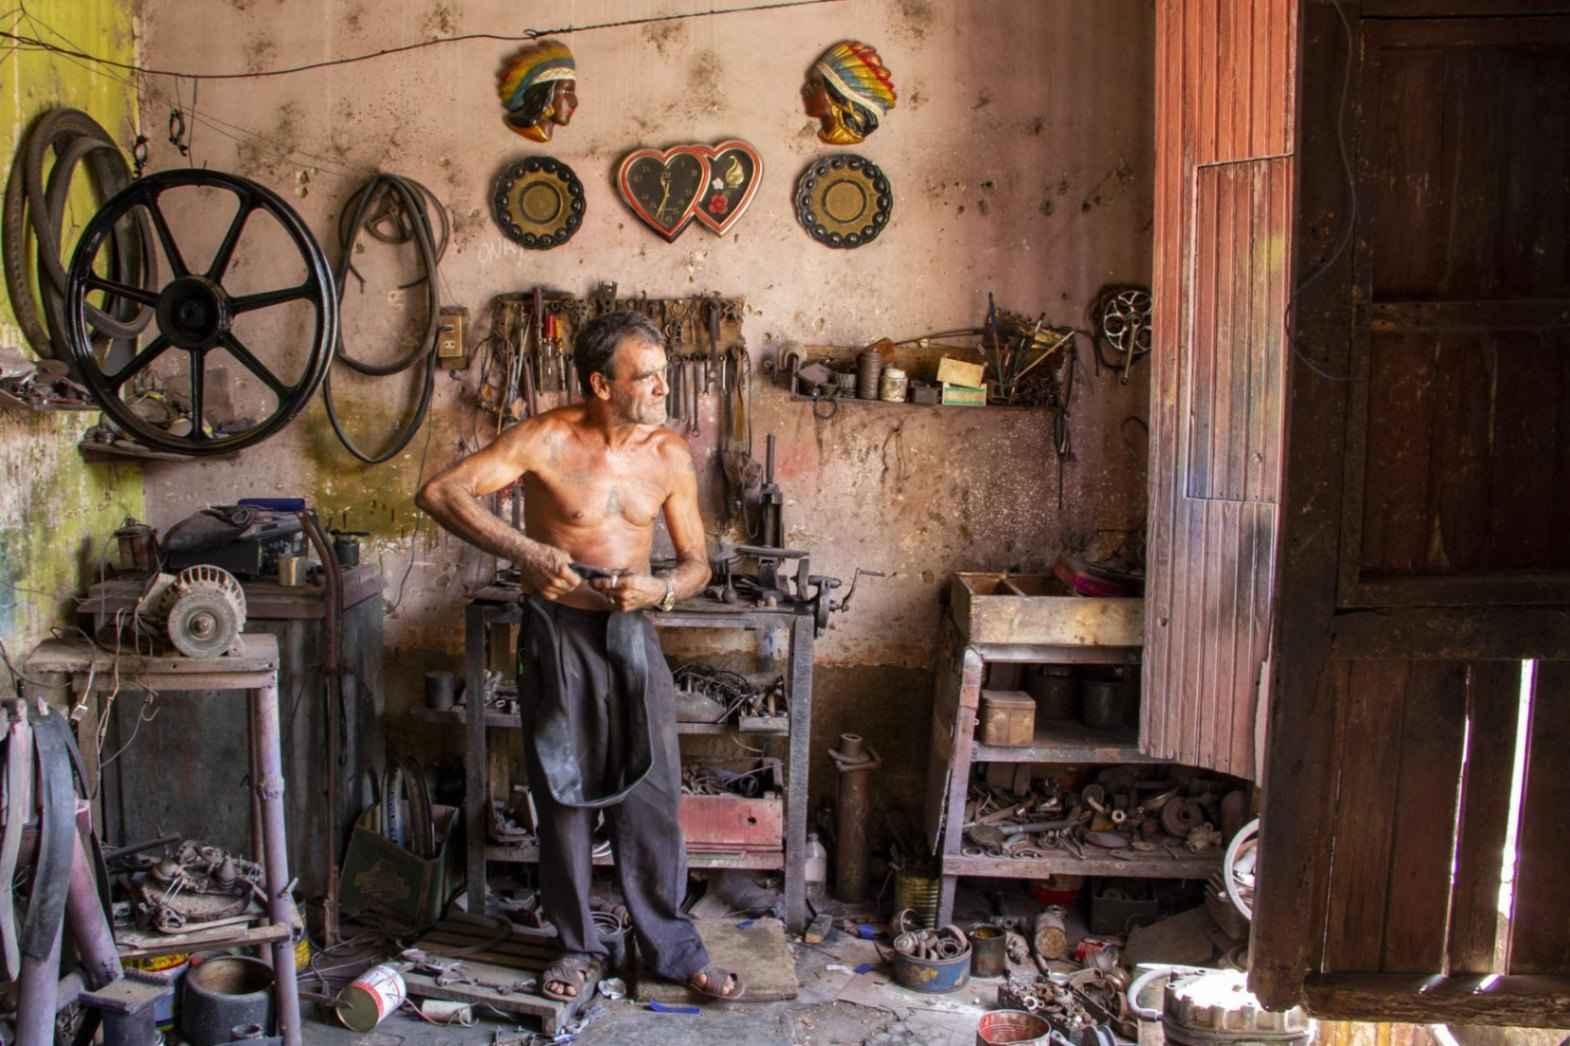 Obra: Cuba, after the Soviet Union 07